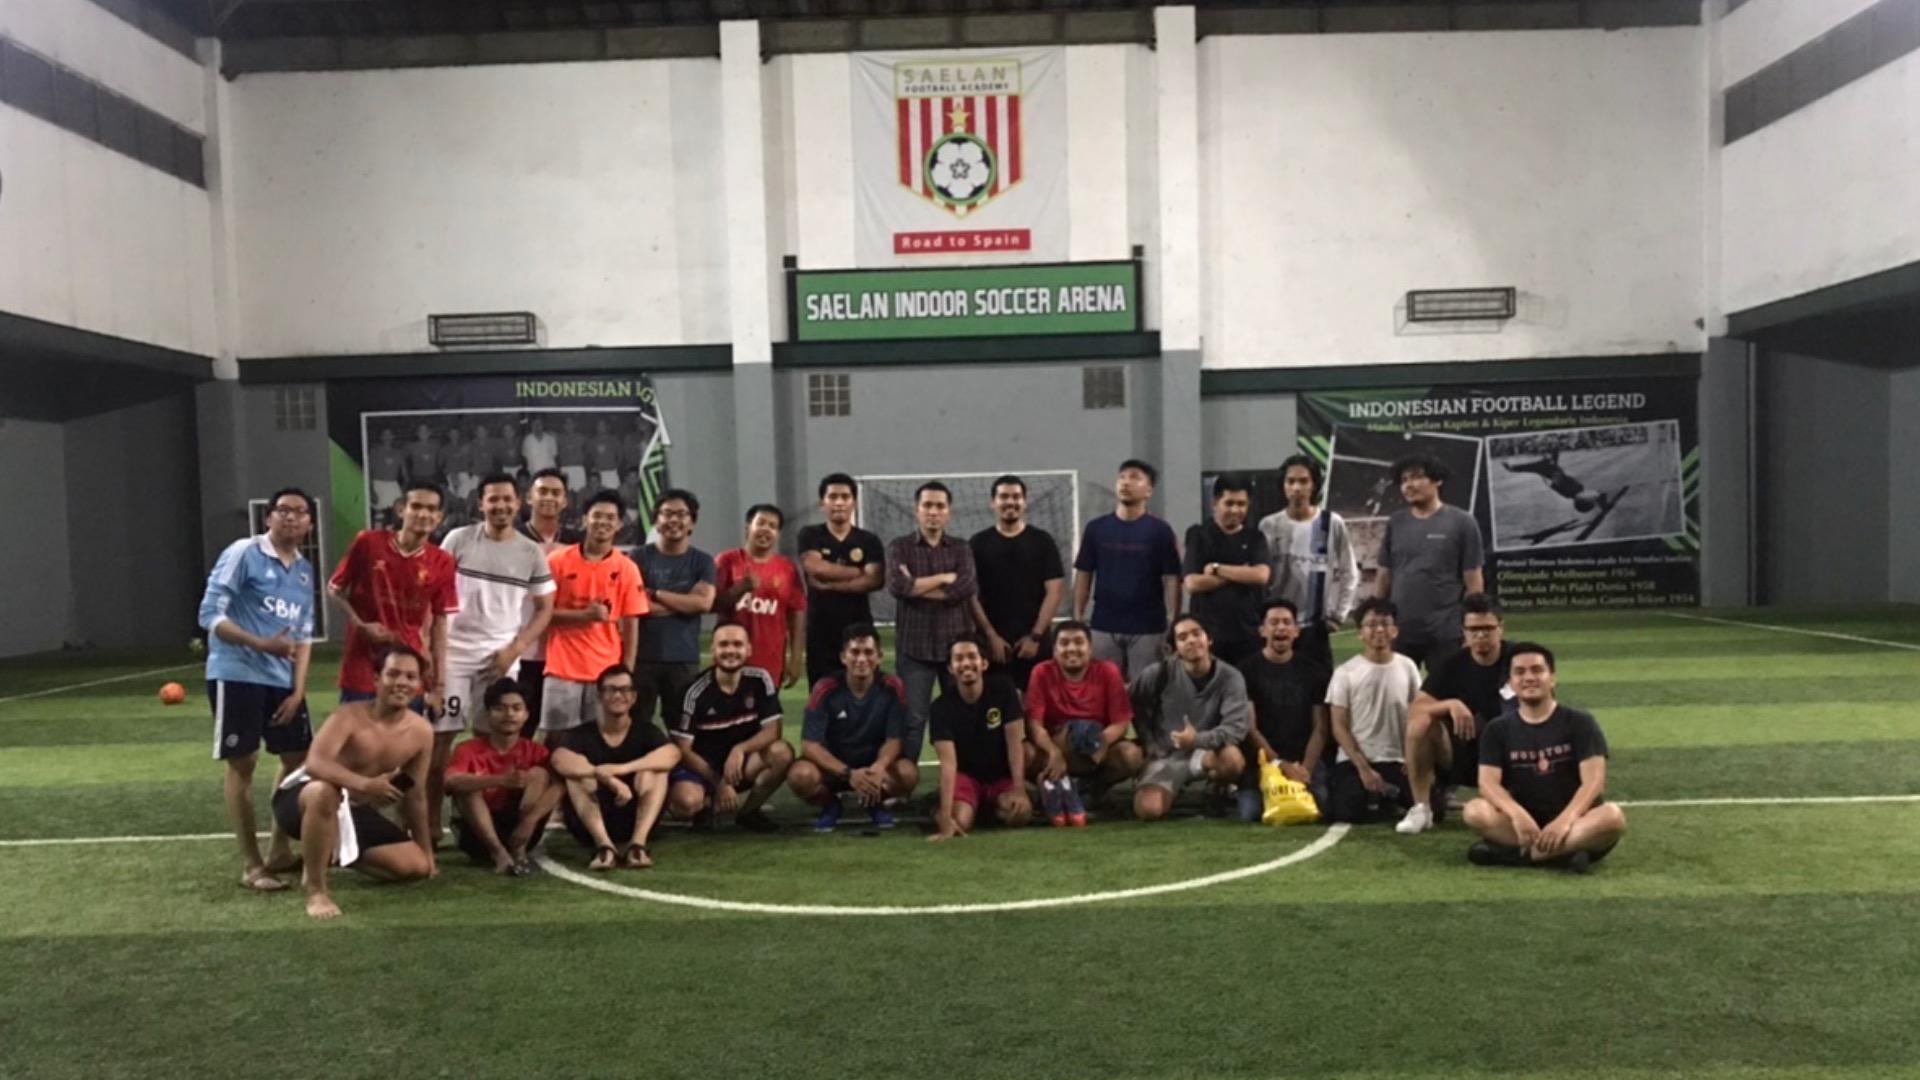 Tuesday Gelora Saelan Futsal